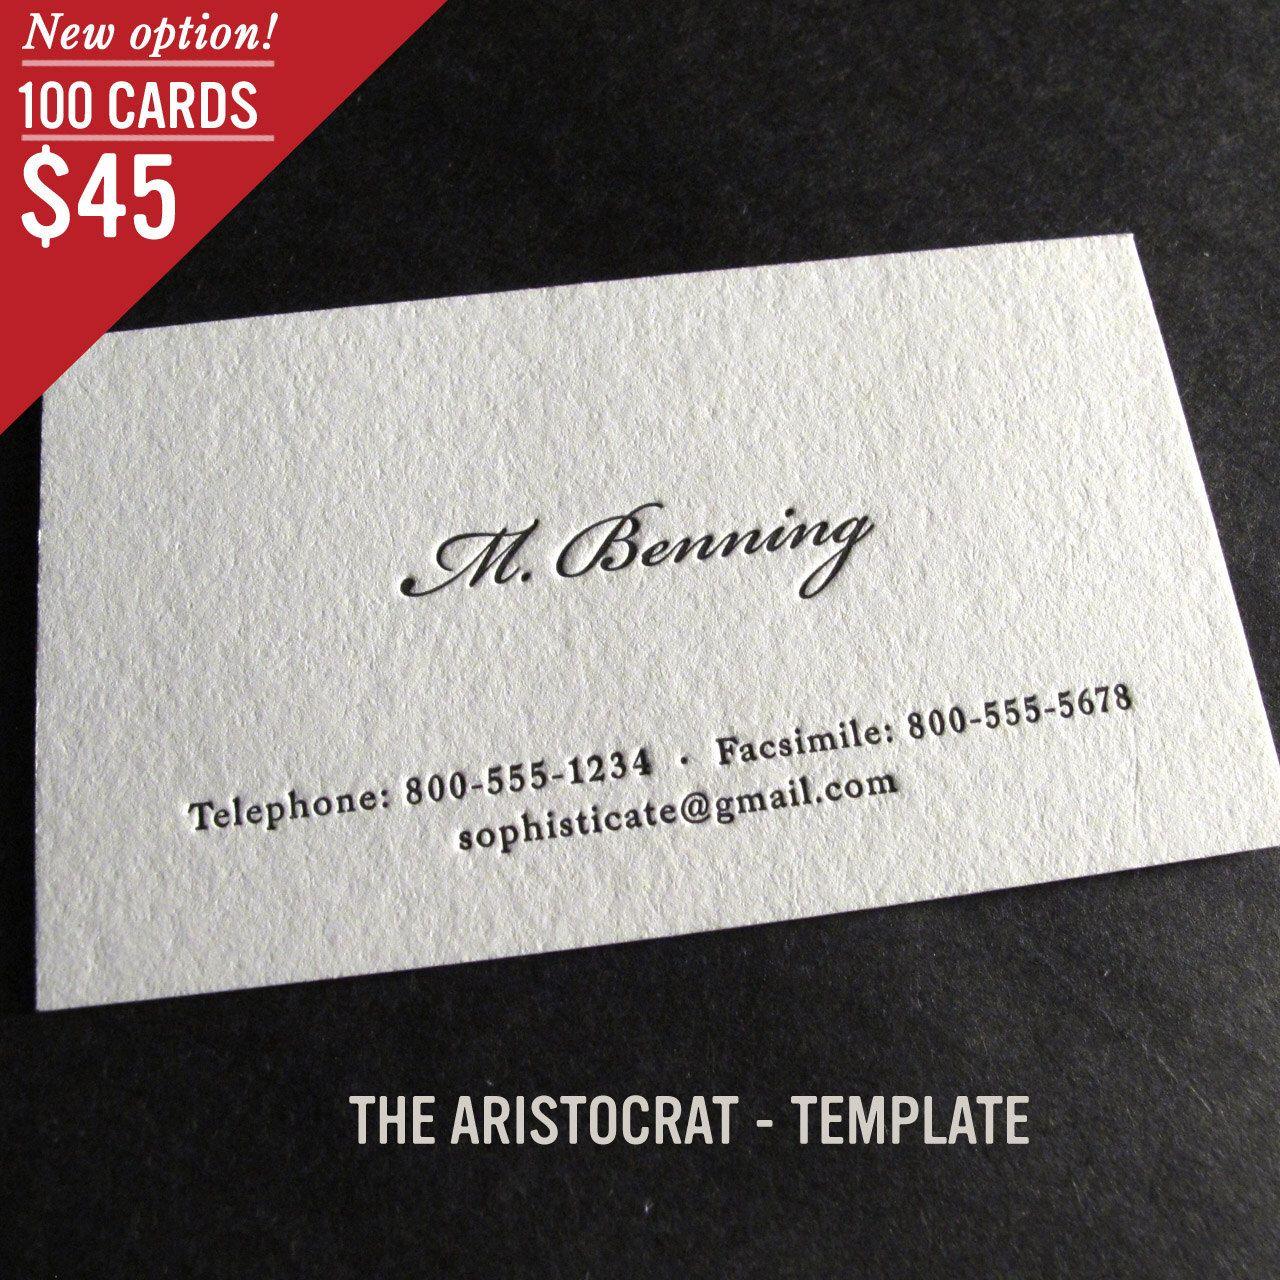 100 Custom Letterpress Business Cards - The Aristocrat ...